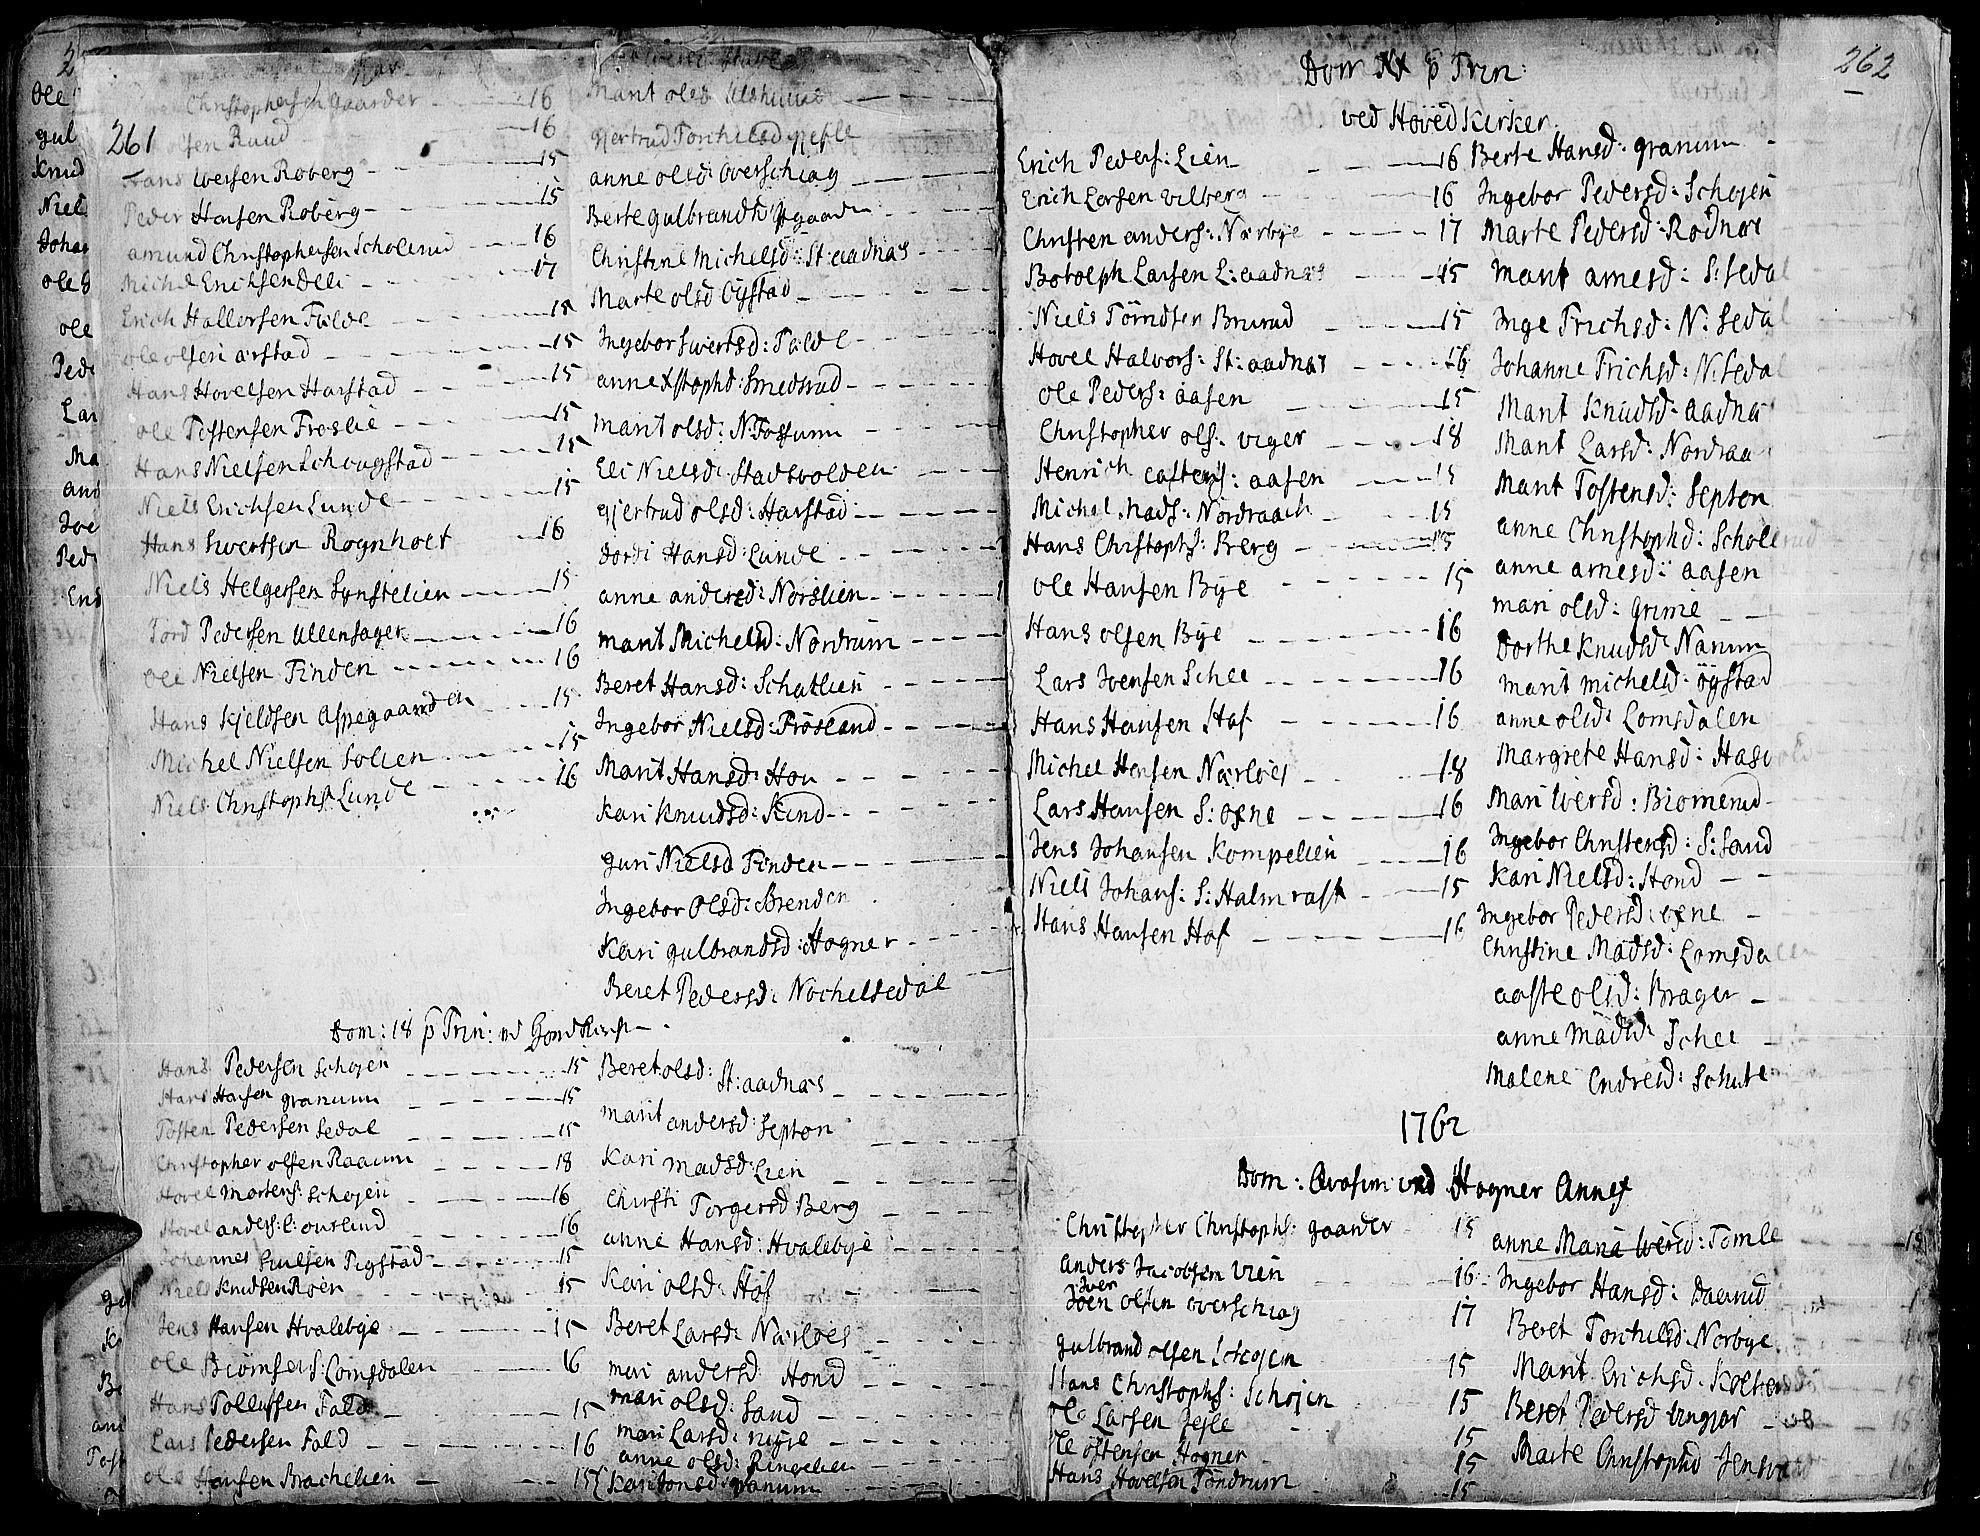 SAH, Land prestekontor, Ministerialbok nr. 2, 1733-1764, s. 261-262